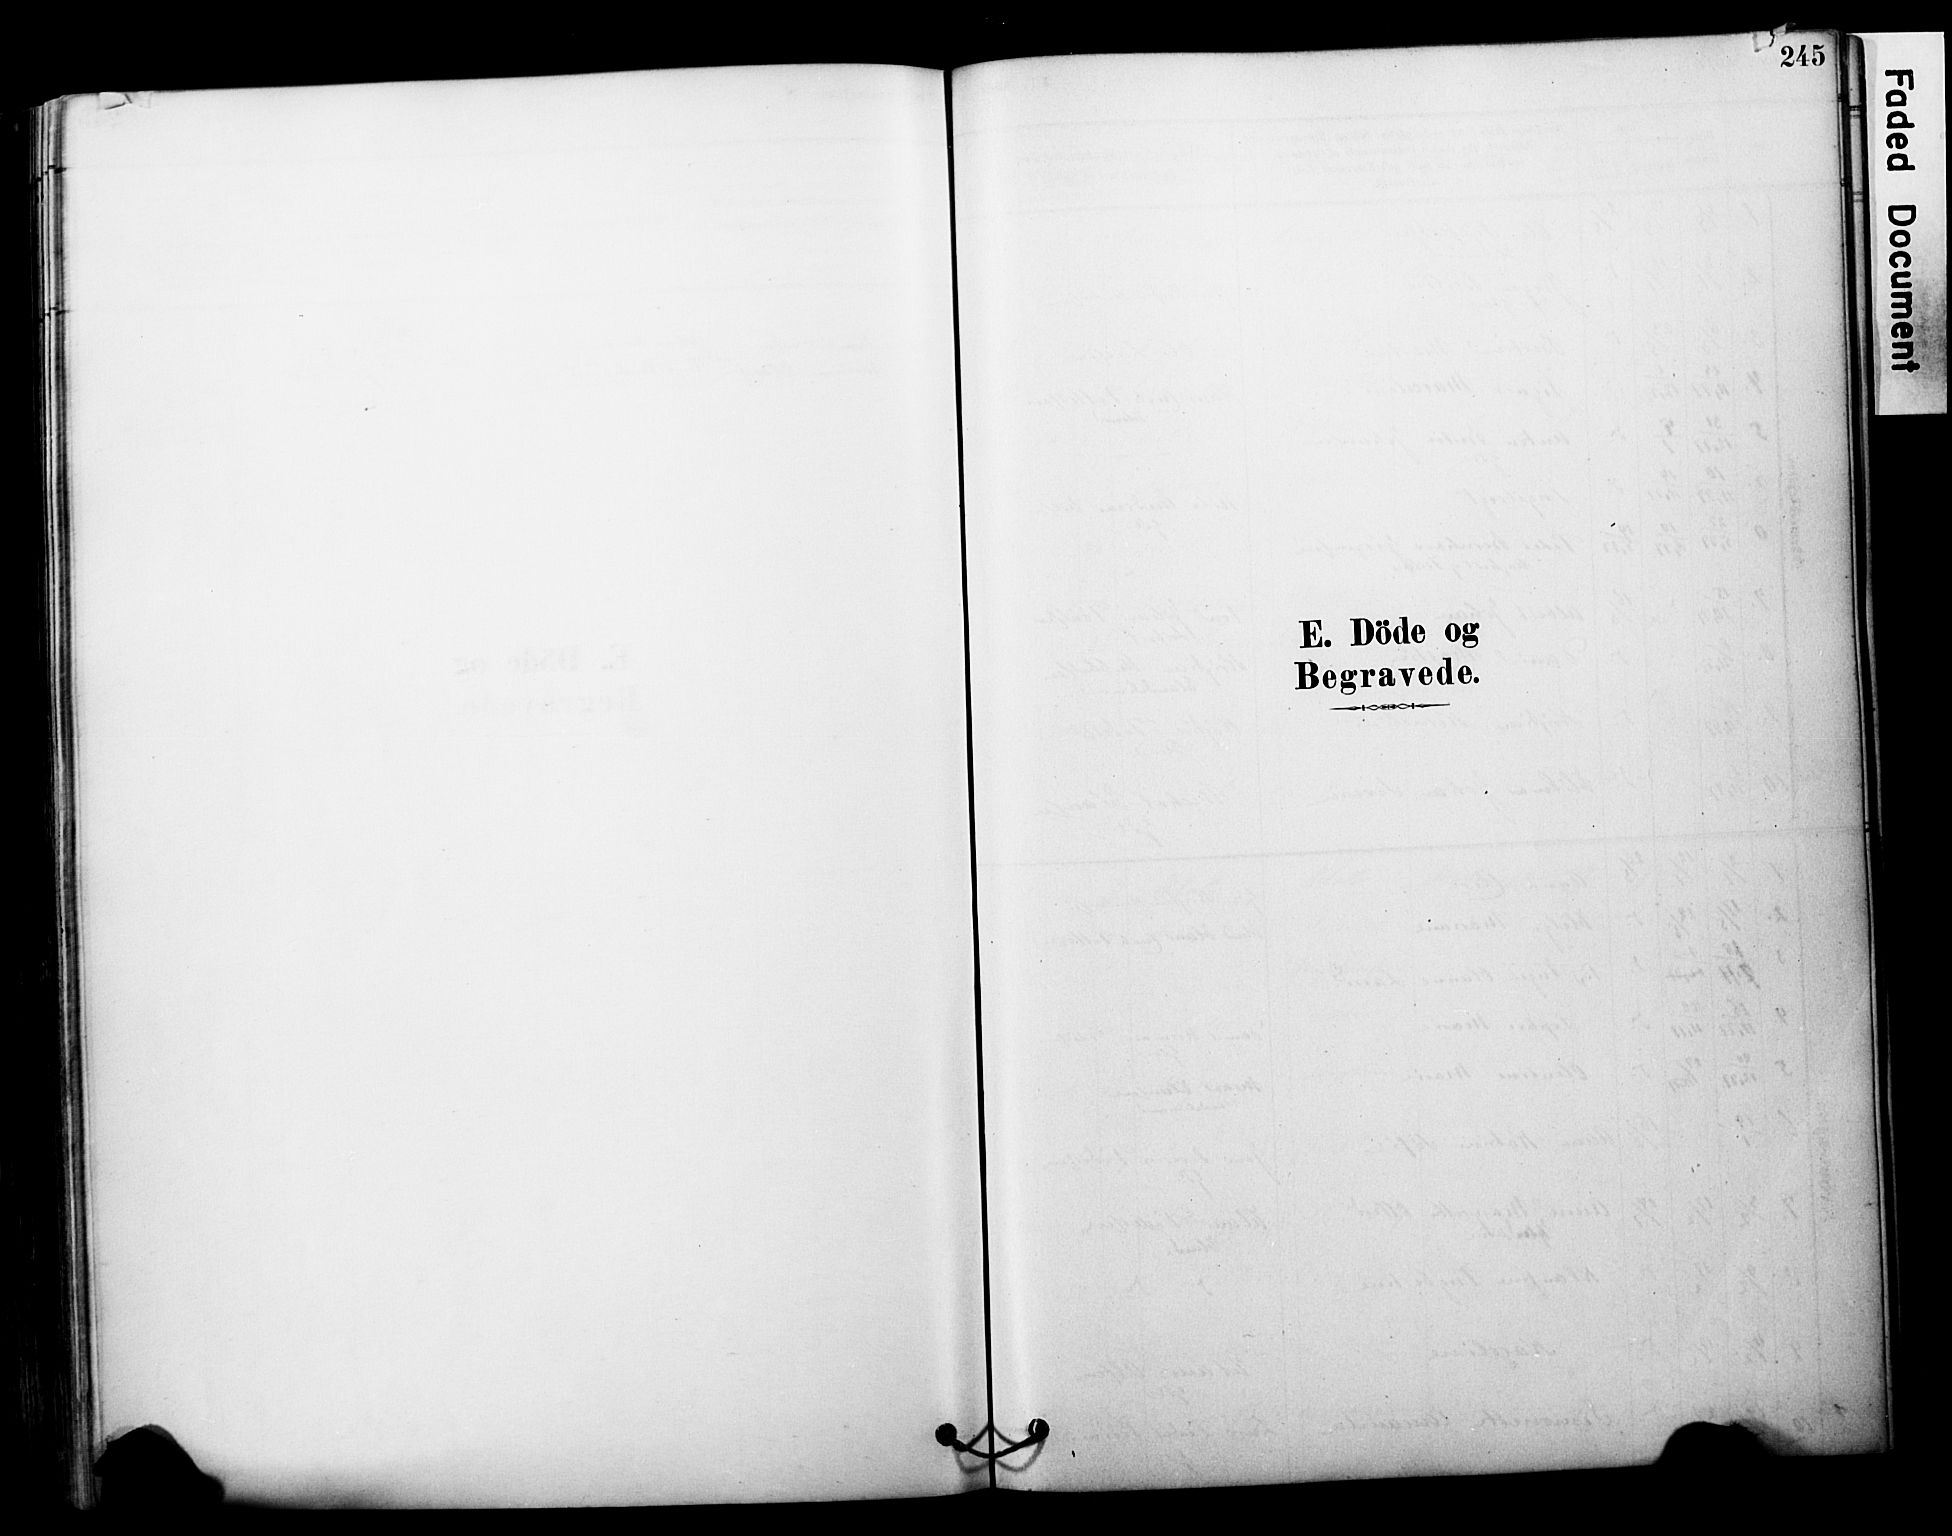 SATØ, Tranøy sokneprestkontor, I/Ia/Iaa/L0011kirke: Ministerialbok nr. 11, 1878-1904, s. 245